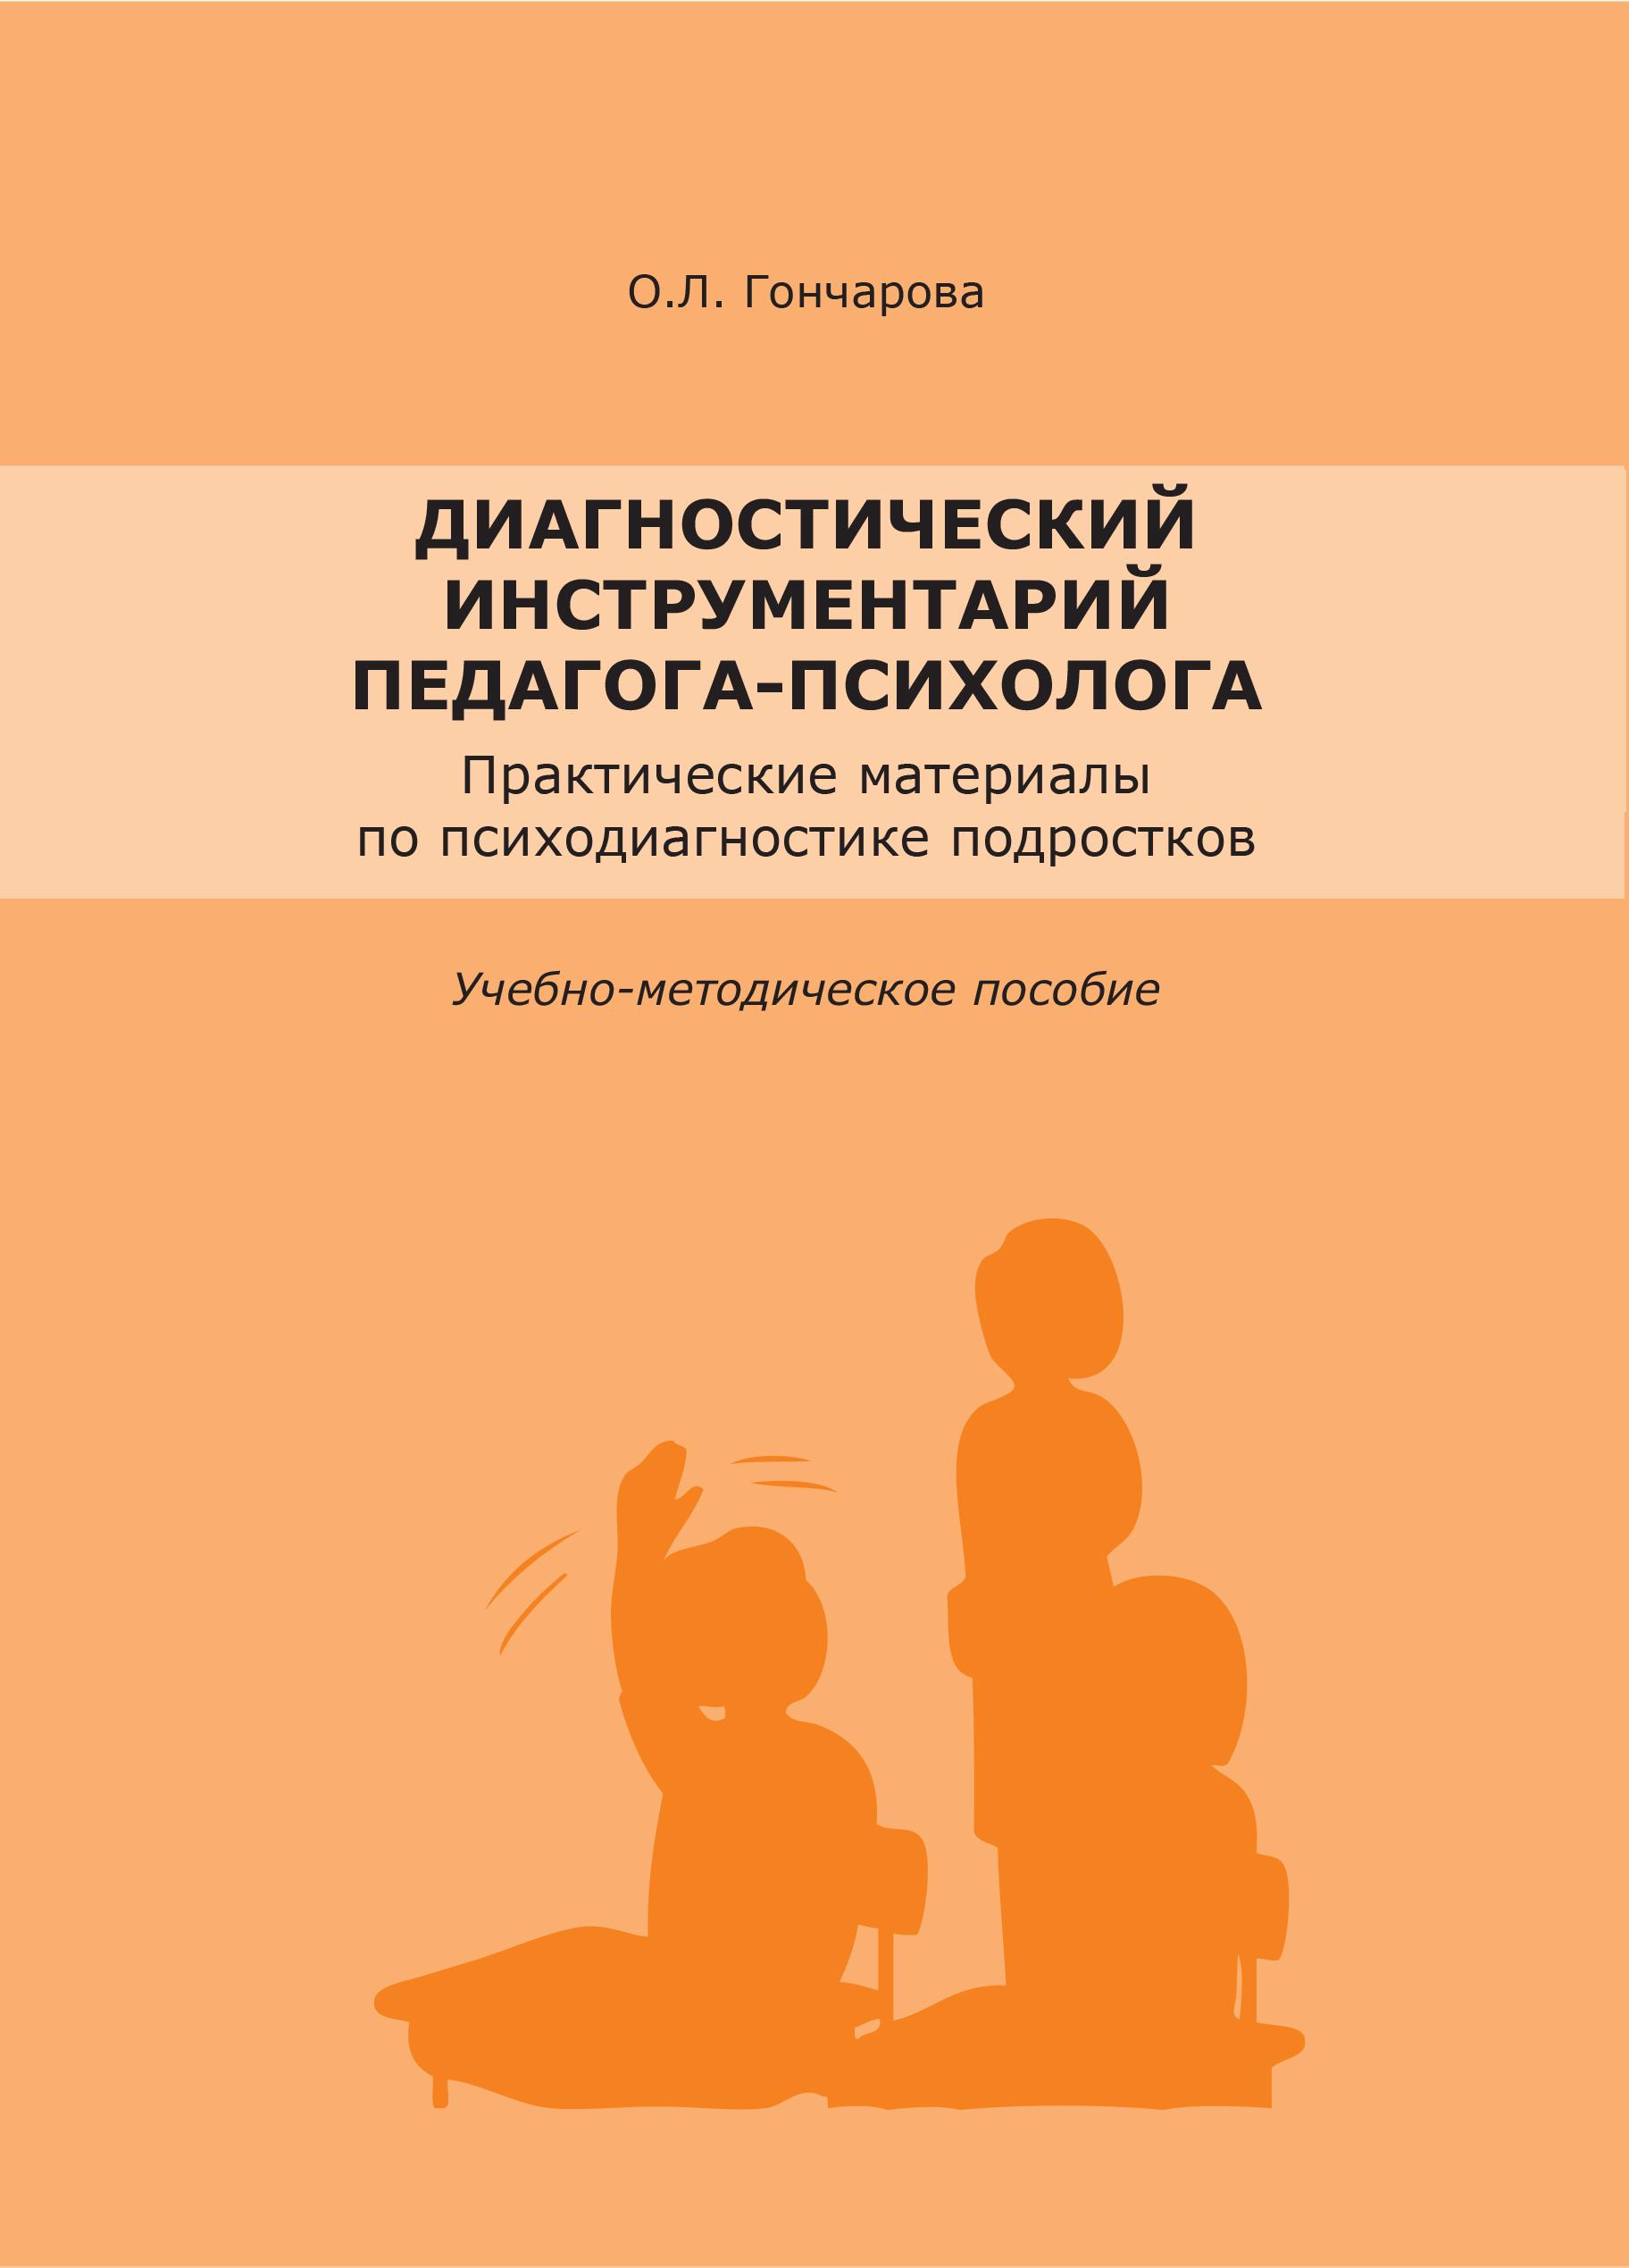 Диагностический инструментарий педагога-психолога